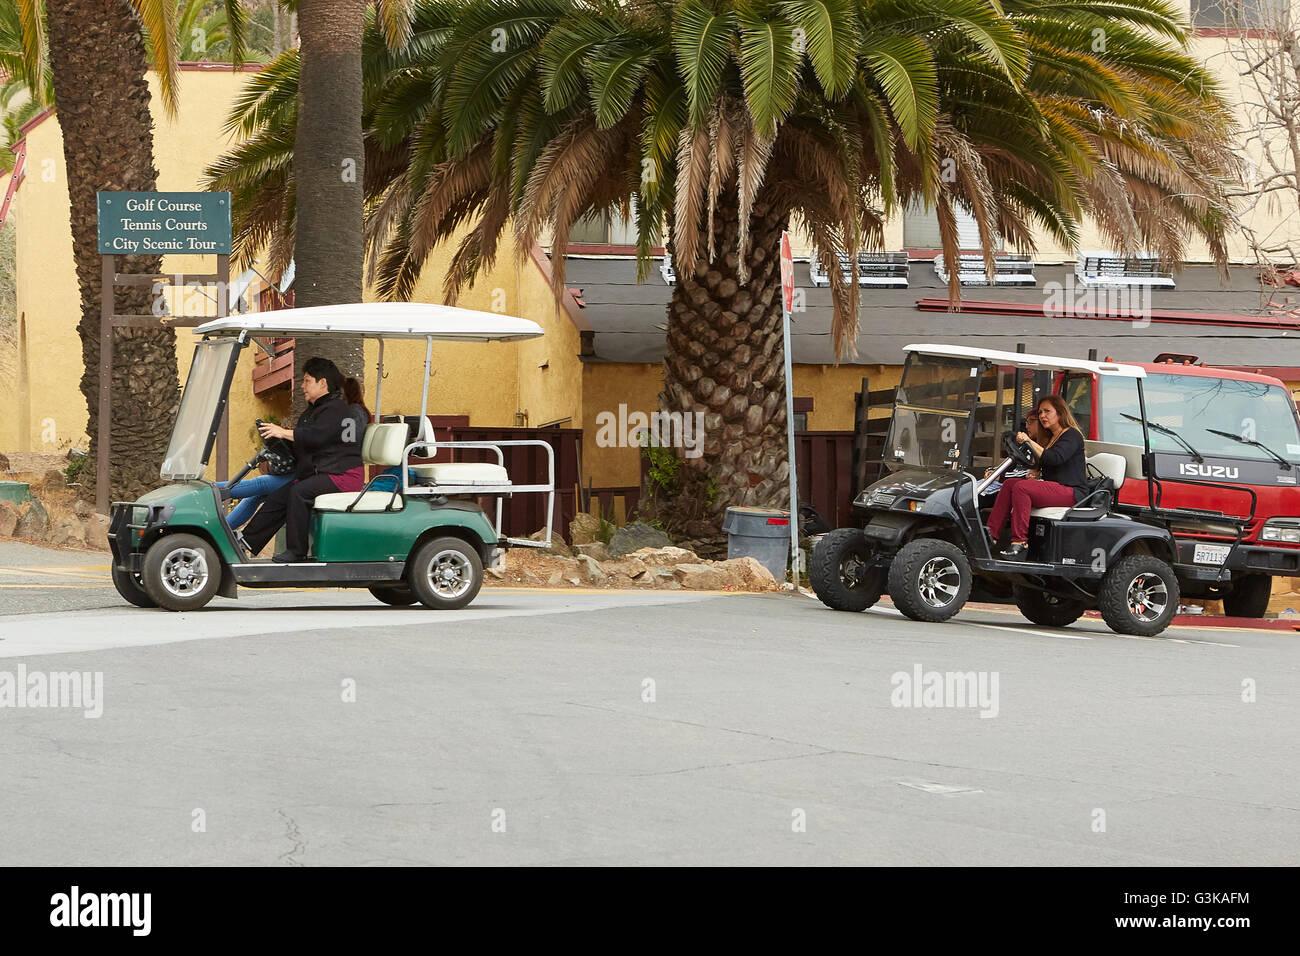 Morning Golf Cart School Run In Avalon, Santa Catalina Island, California. - Stock Image